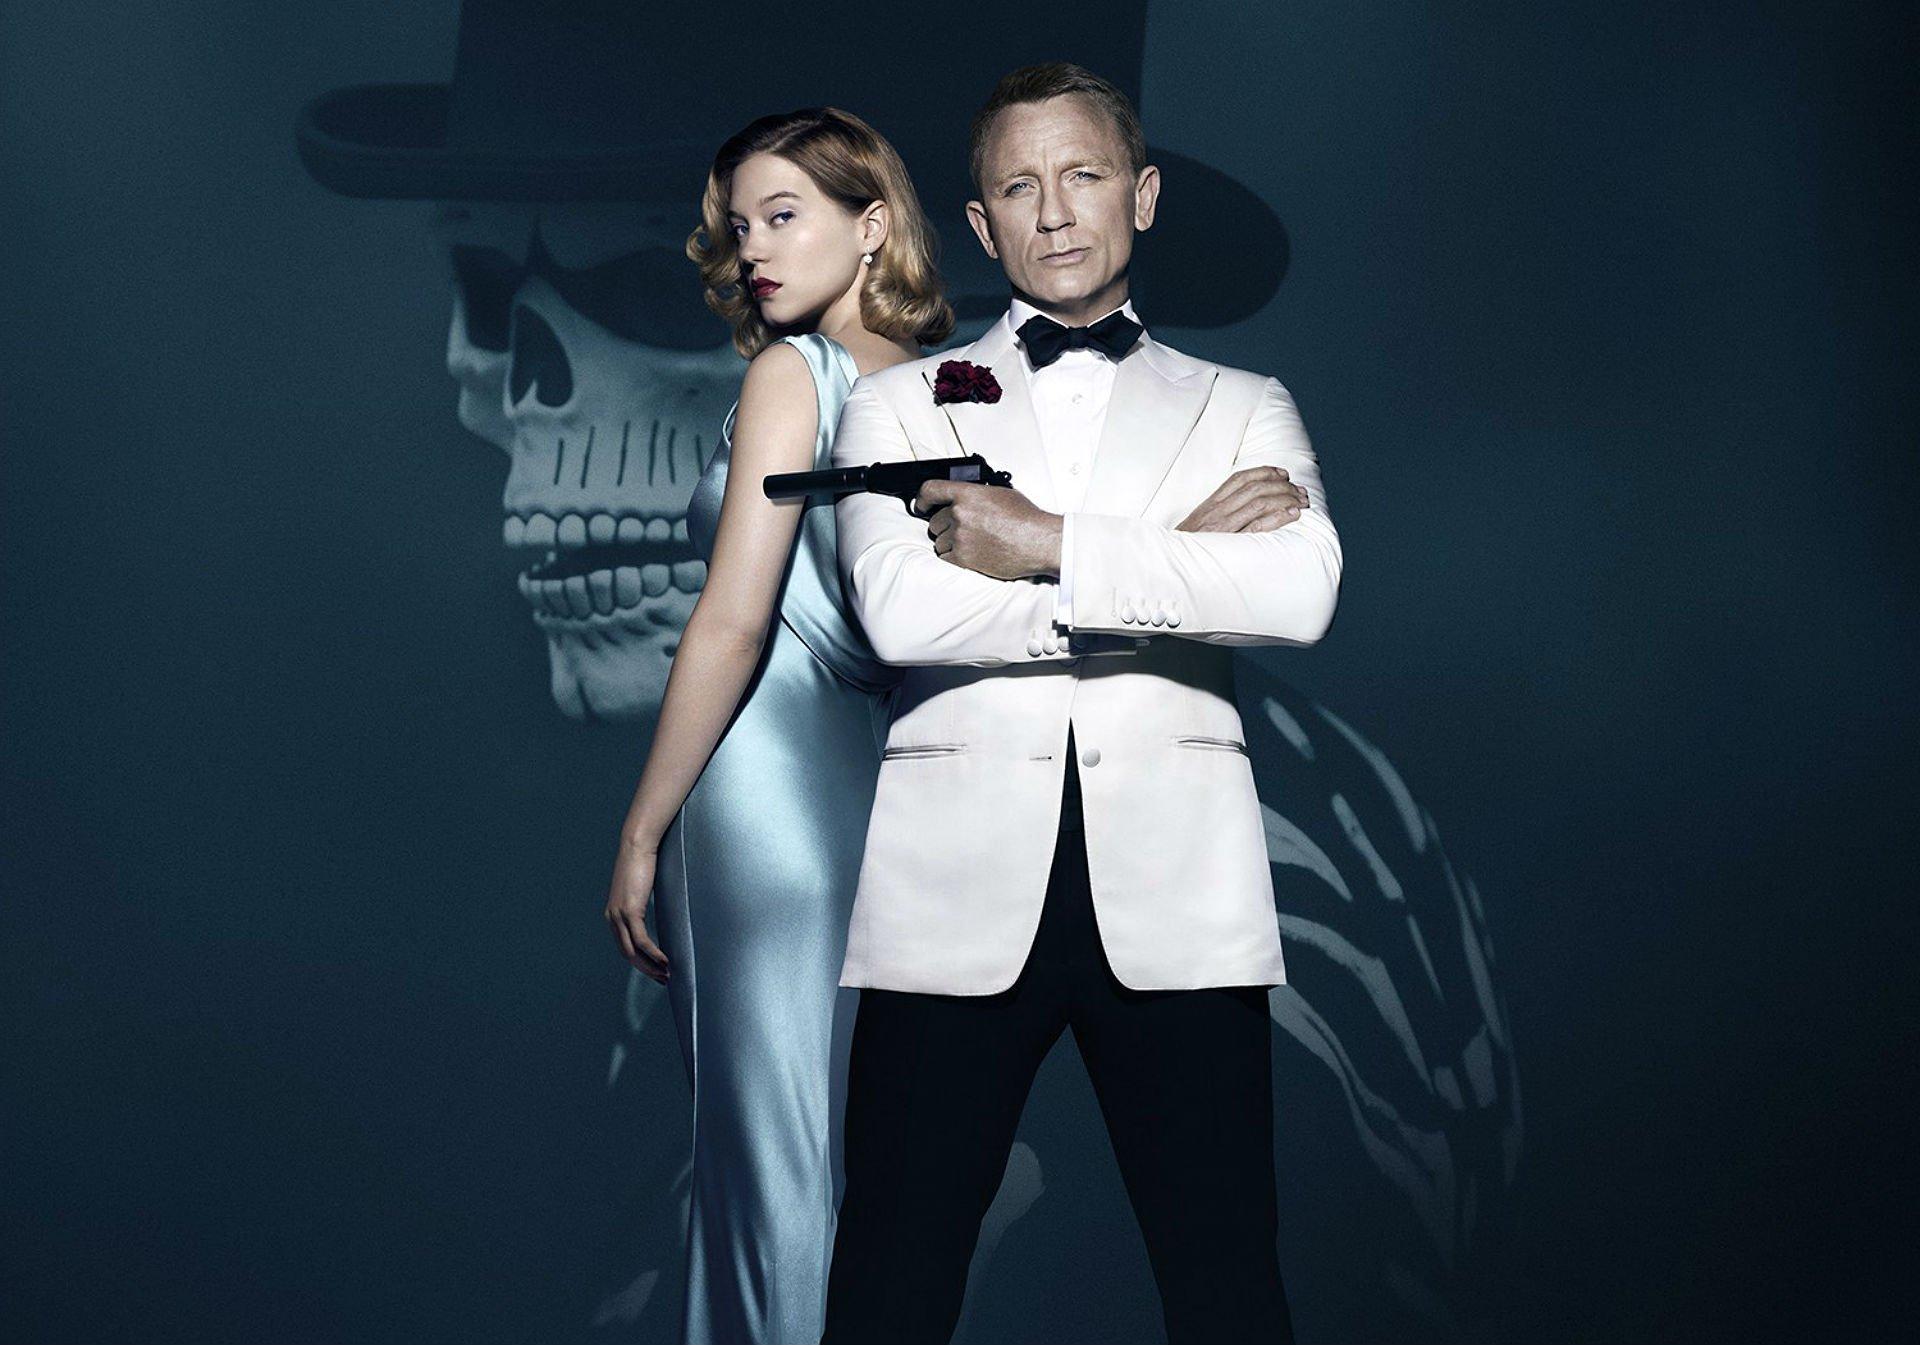 SPECTRE 007 BOND 24 james action 1spectre crime mystery ...